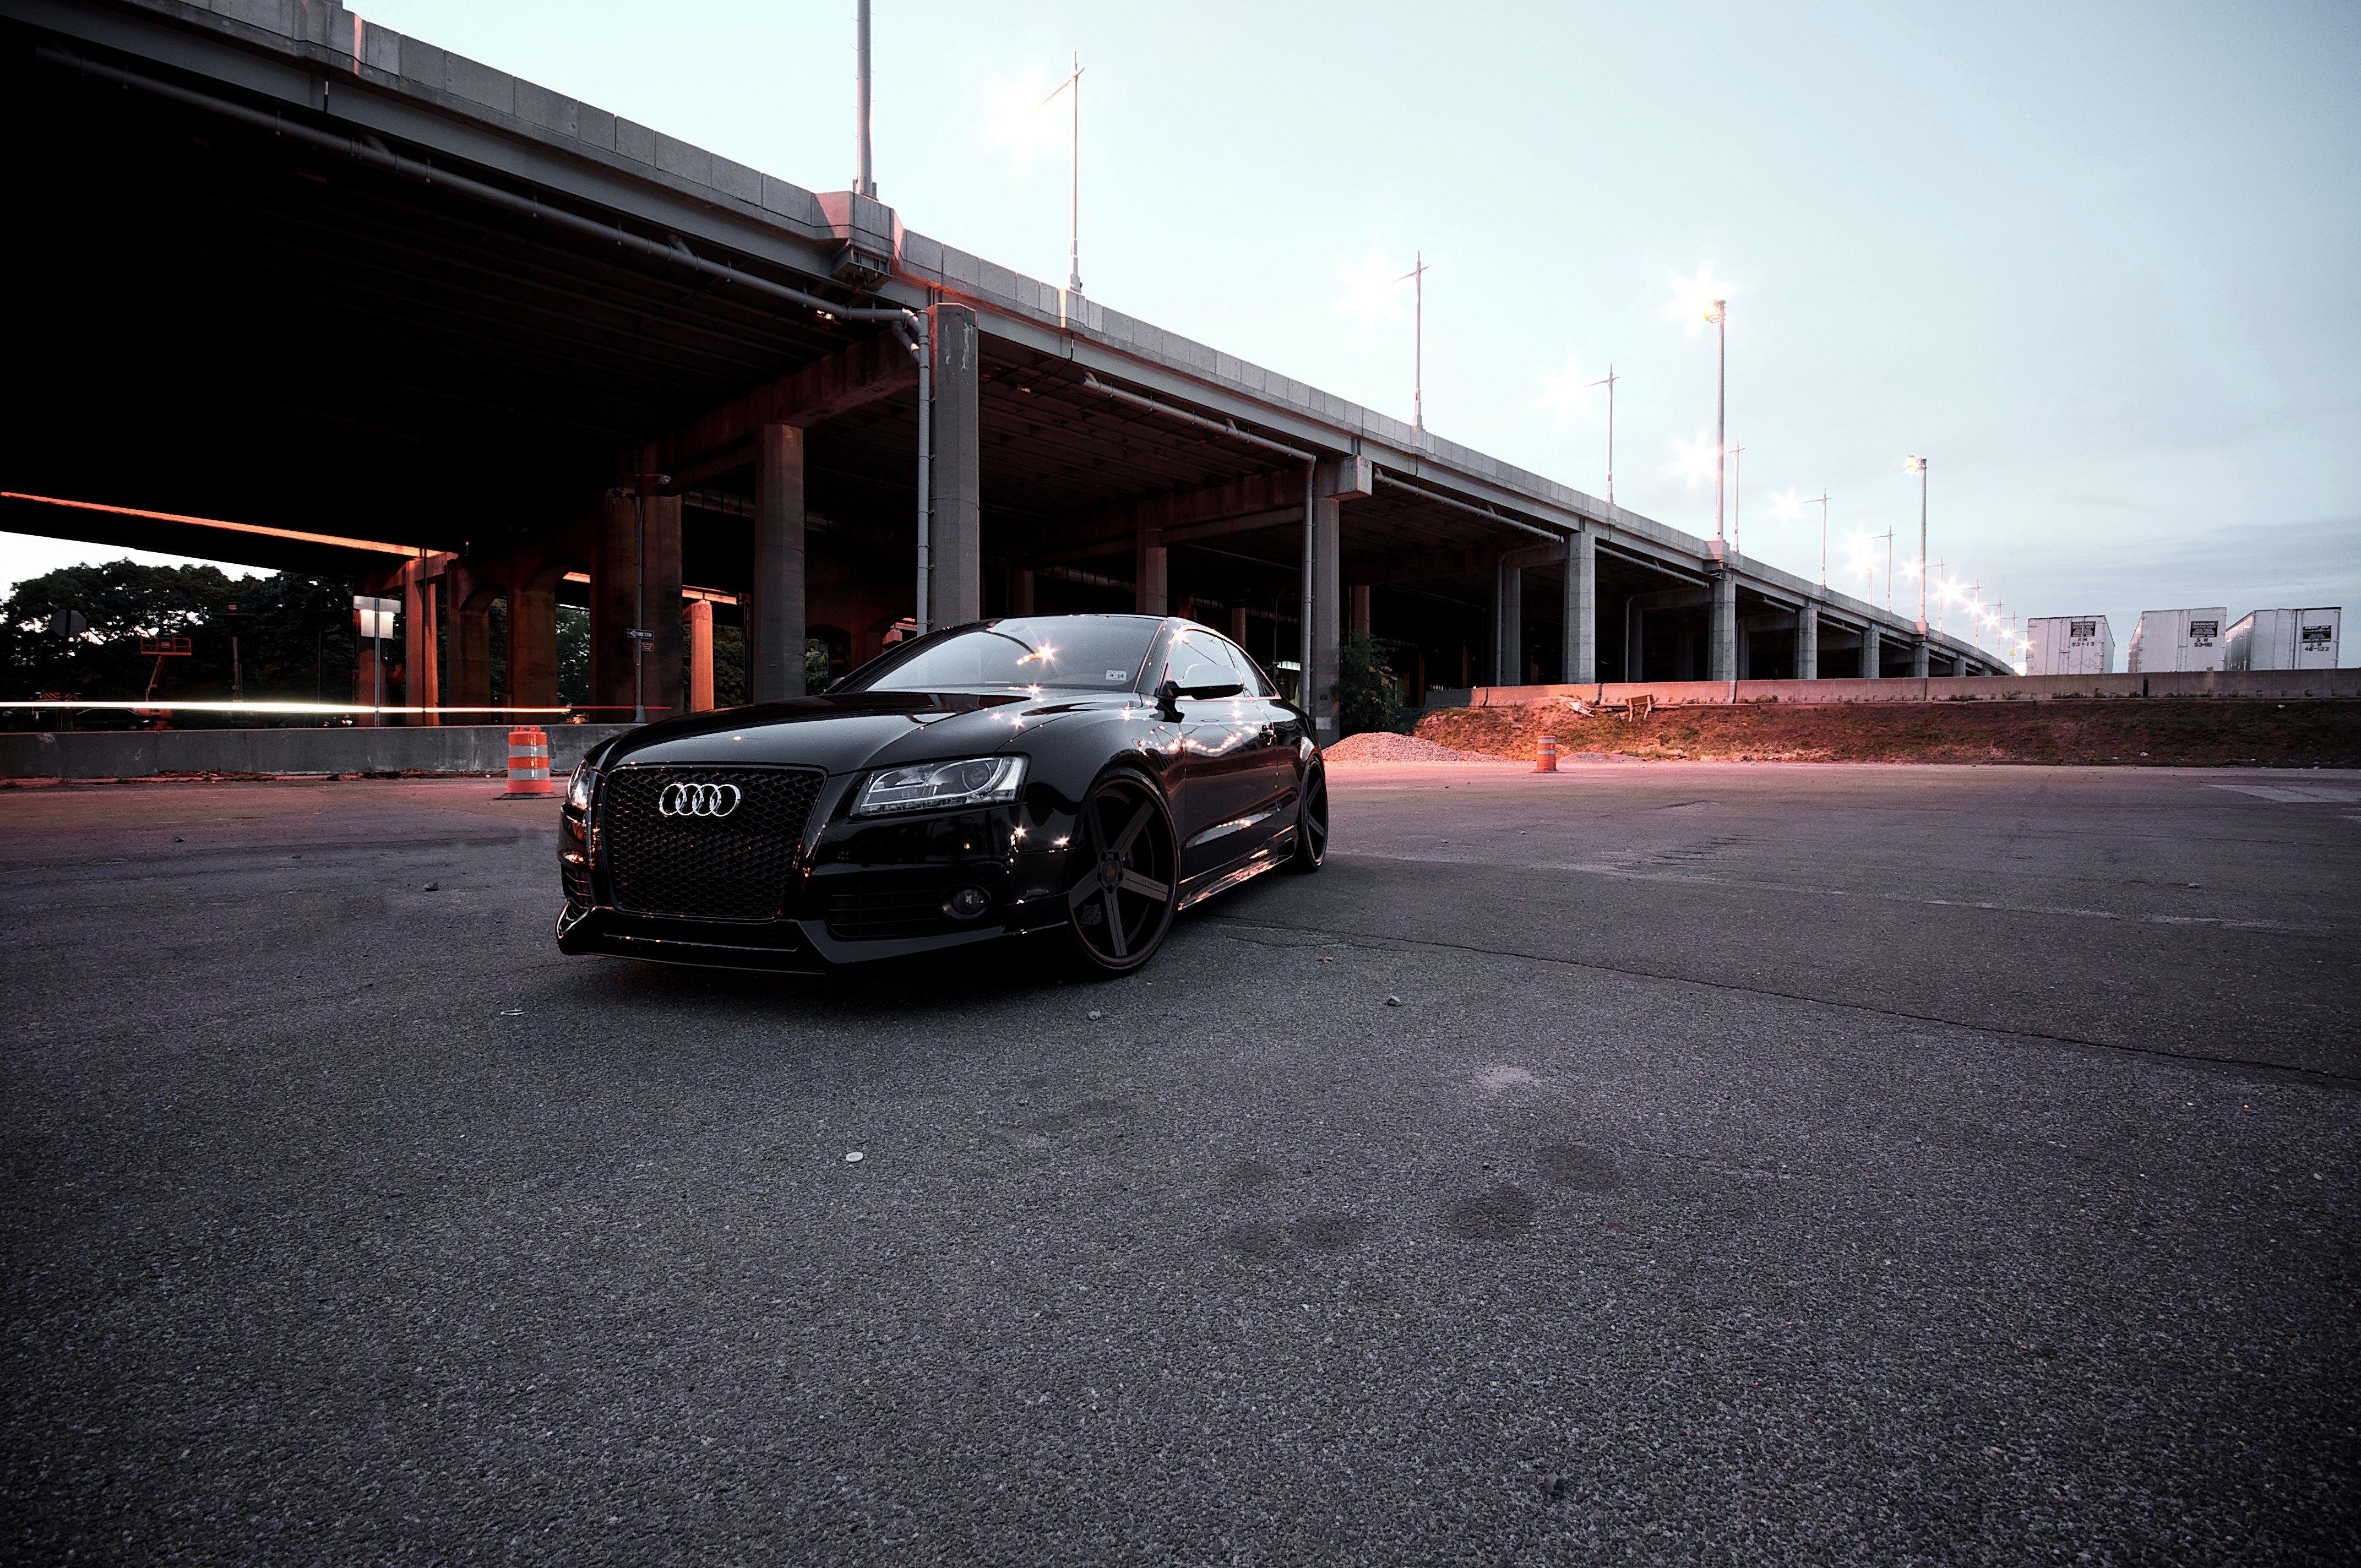 4288x2848 Hd Widescreen Wallpaper Audi Rs5 Audi Rs5 Black Audi Audi S5